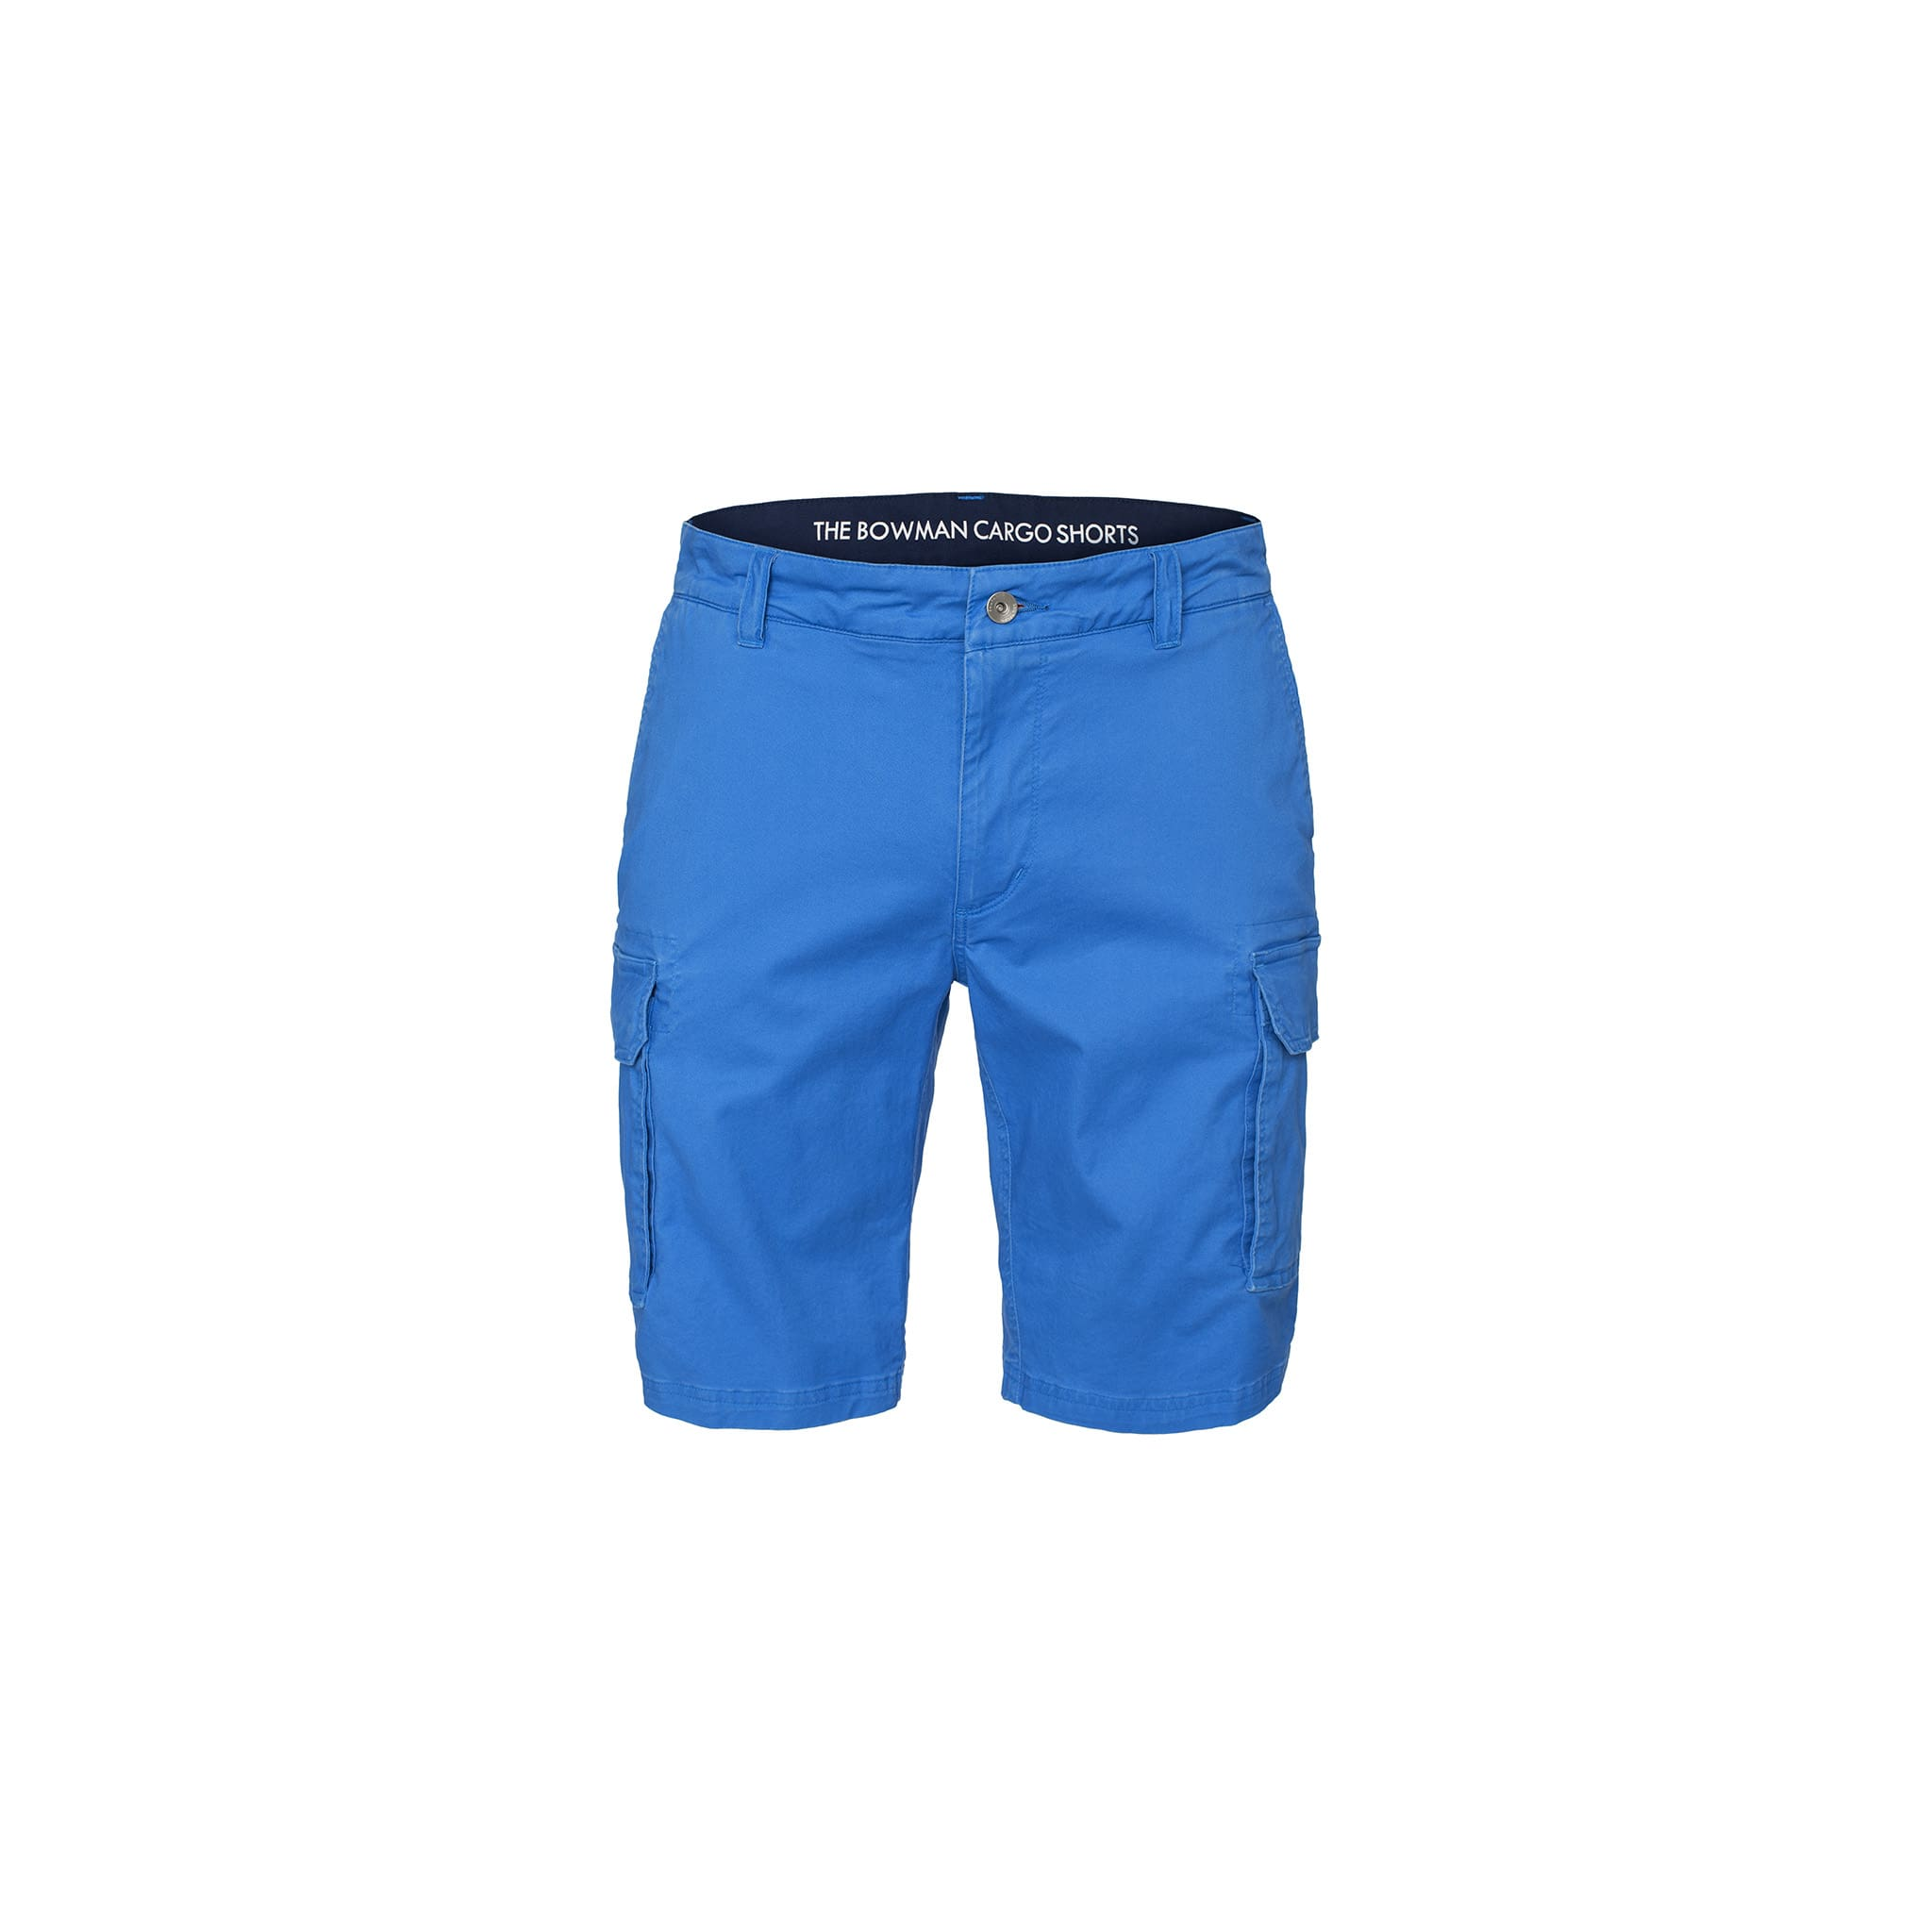 Bowman Cargo Shorts